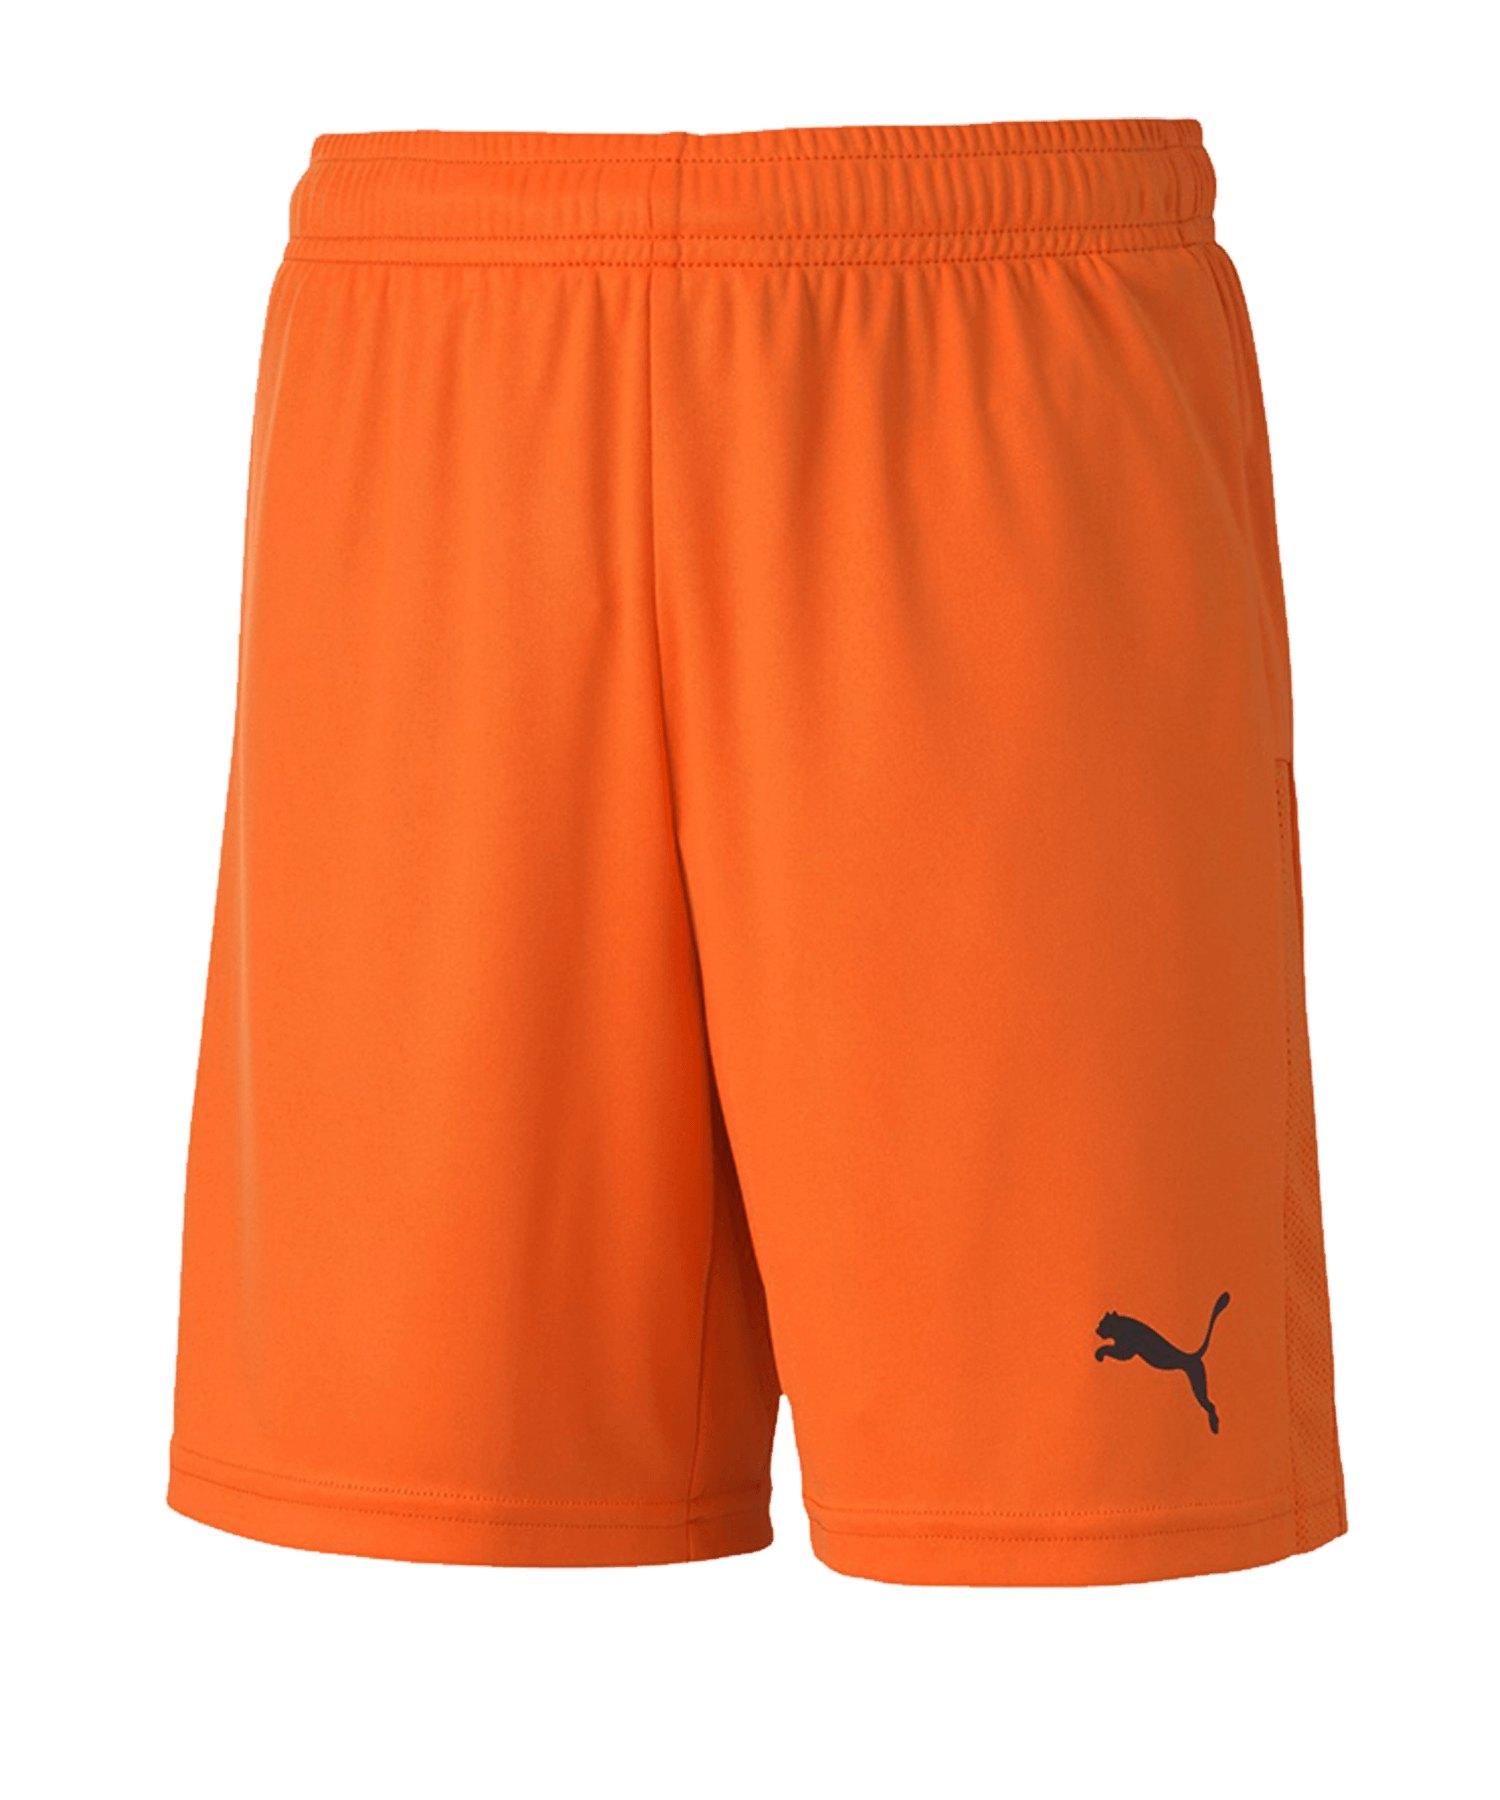 PUMA teamGOAL 23 Knit Short Kids Orange F08 - orange